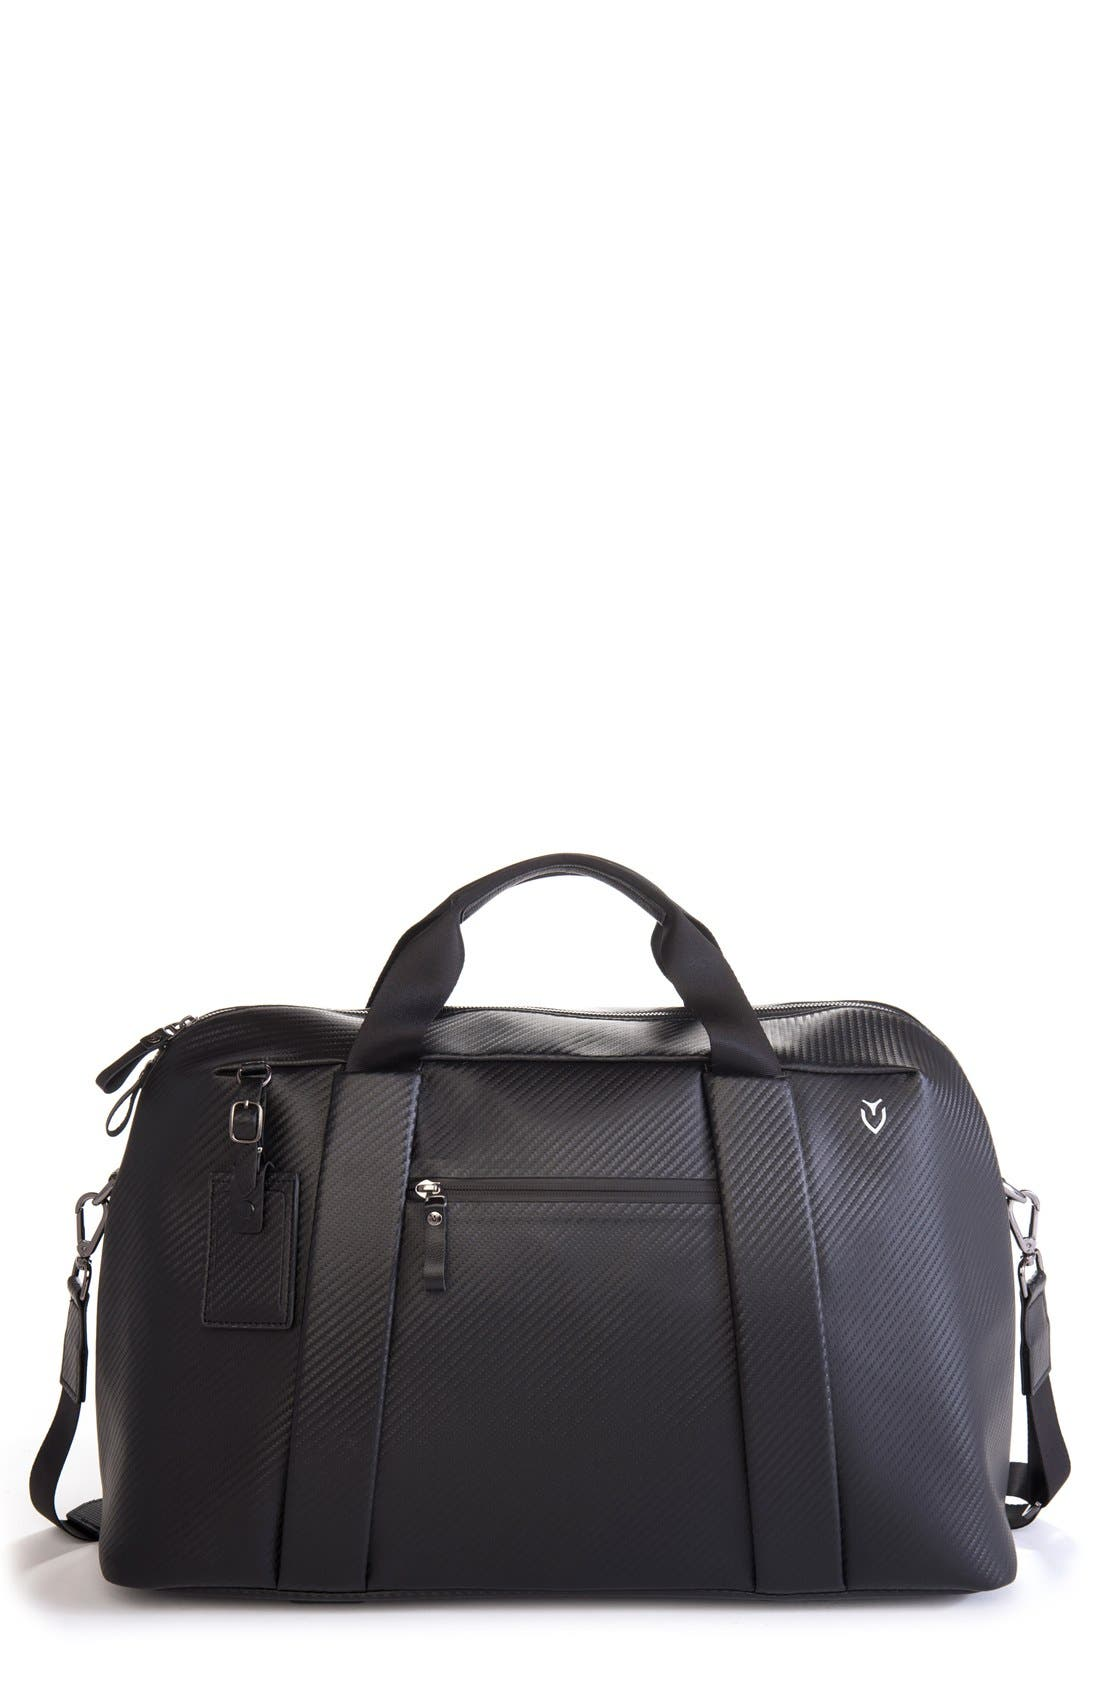 'Signature' Large Duffel Bag,                             Main thumbnail 1, color,                             CARBON BLACK